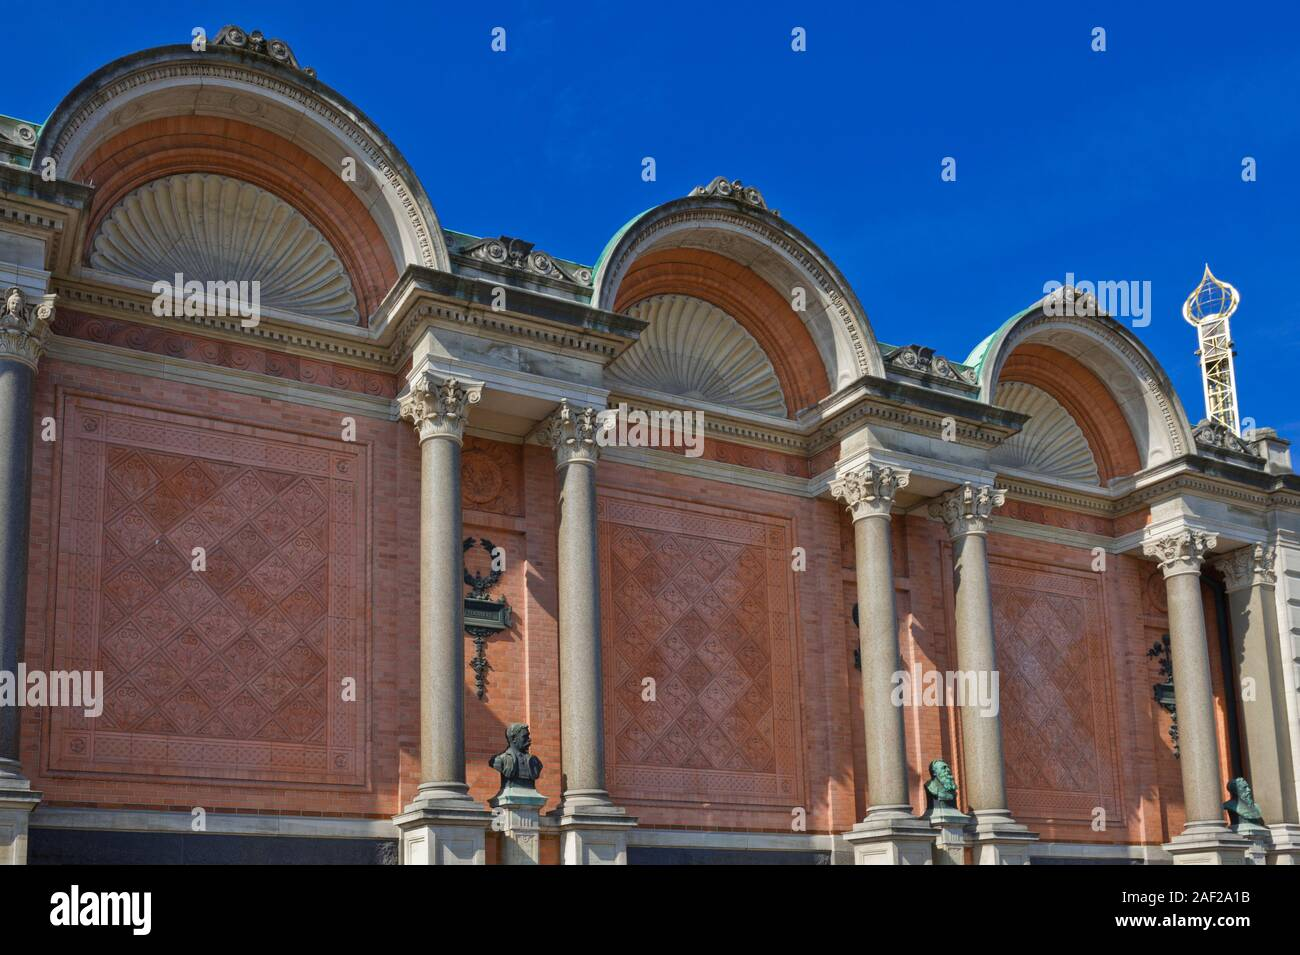 Ny Carlsberg Glyptotek, art museum in Copenhagen, Denmark Stock Photo